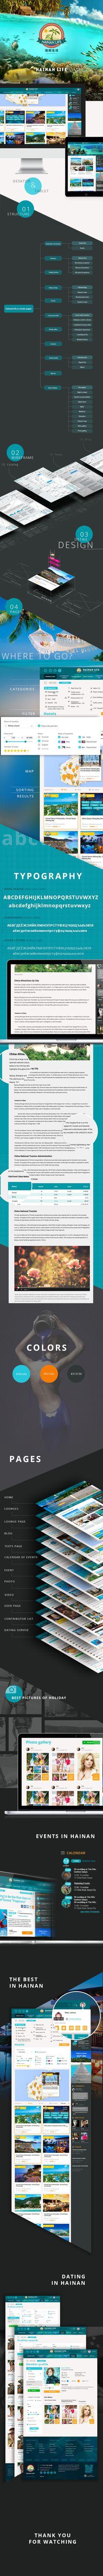 "Portal ""Hainan life"" on Behance"